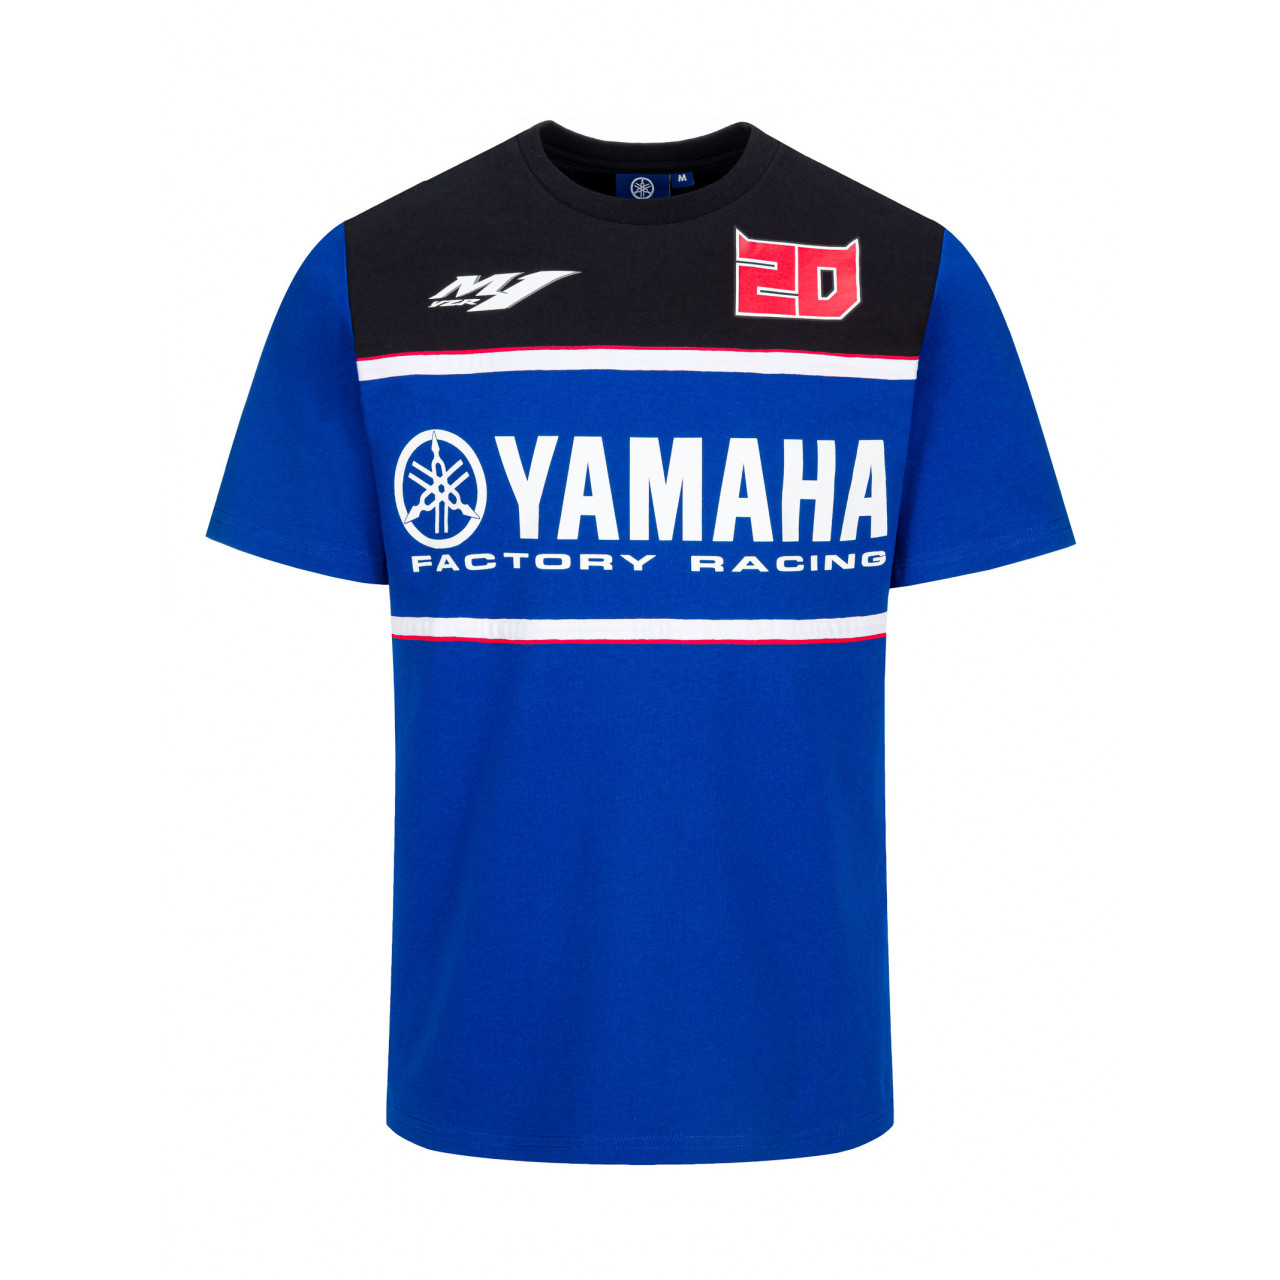 YAMAHA T-shirt homme Fabio Quartararo 2021 bleu et noir